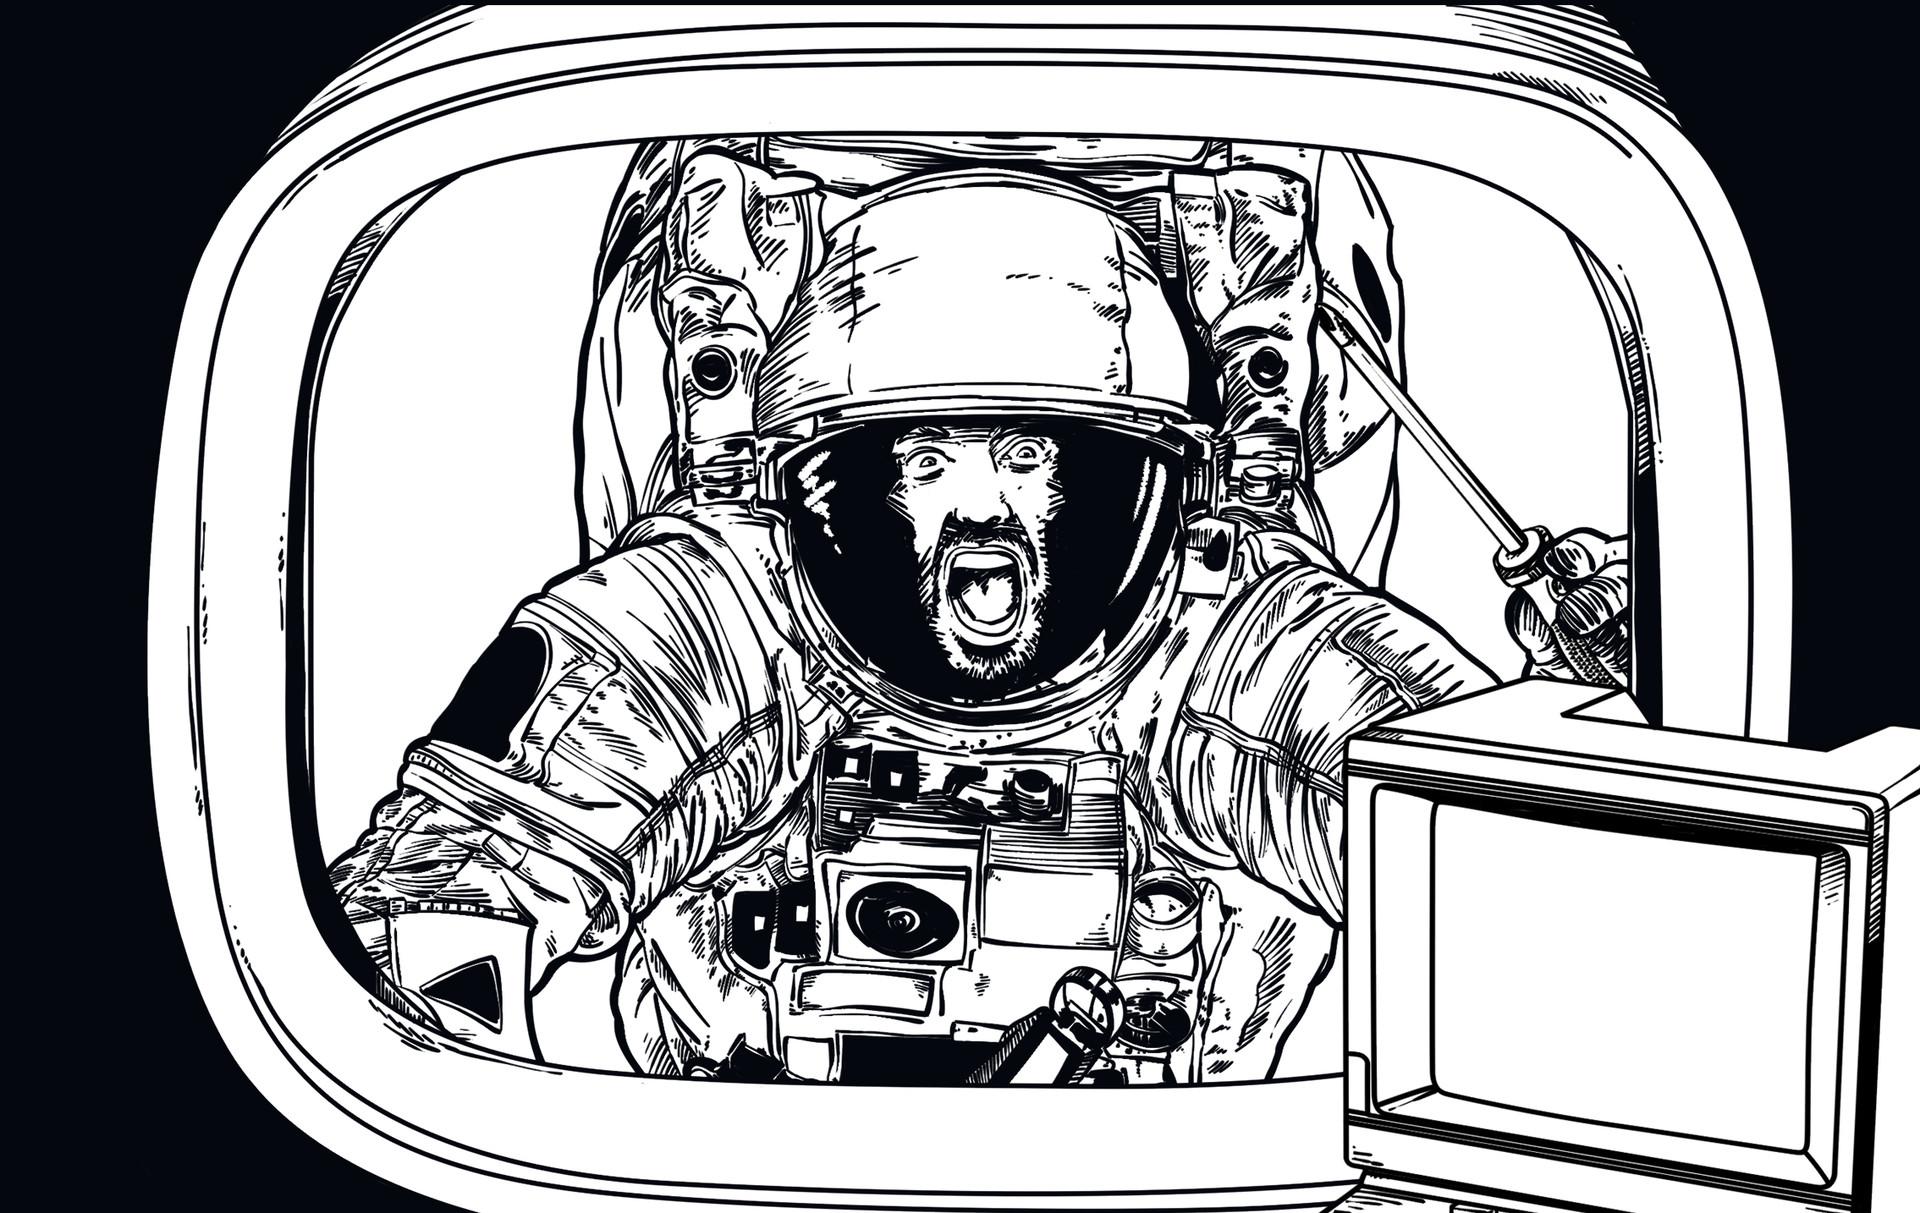 Andy veilski 06 astronaut lineart